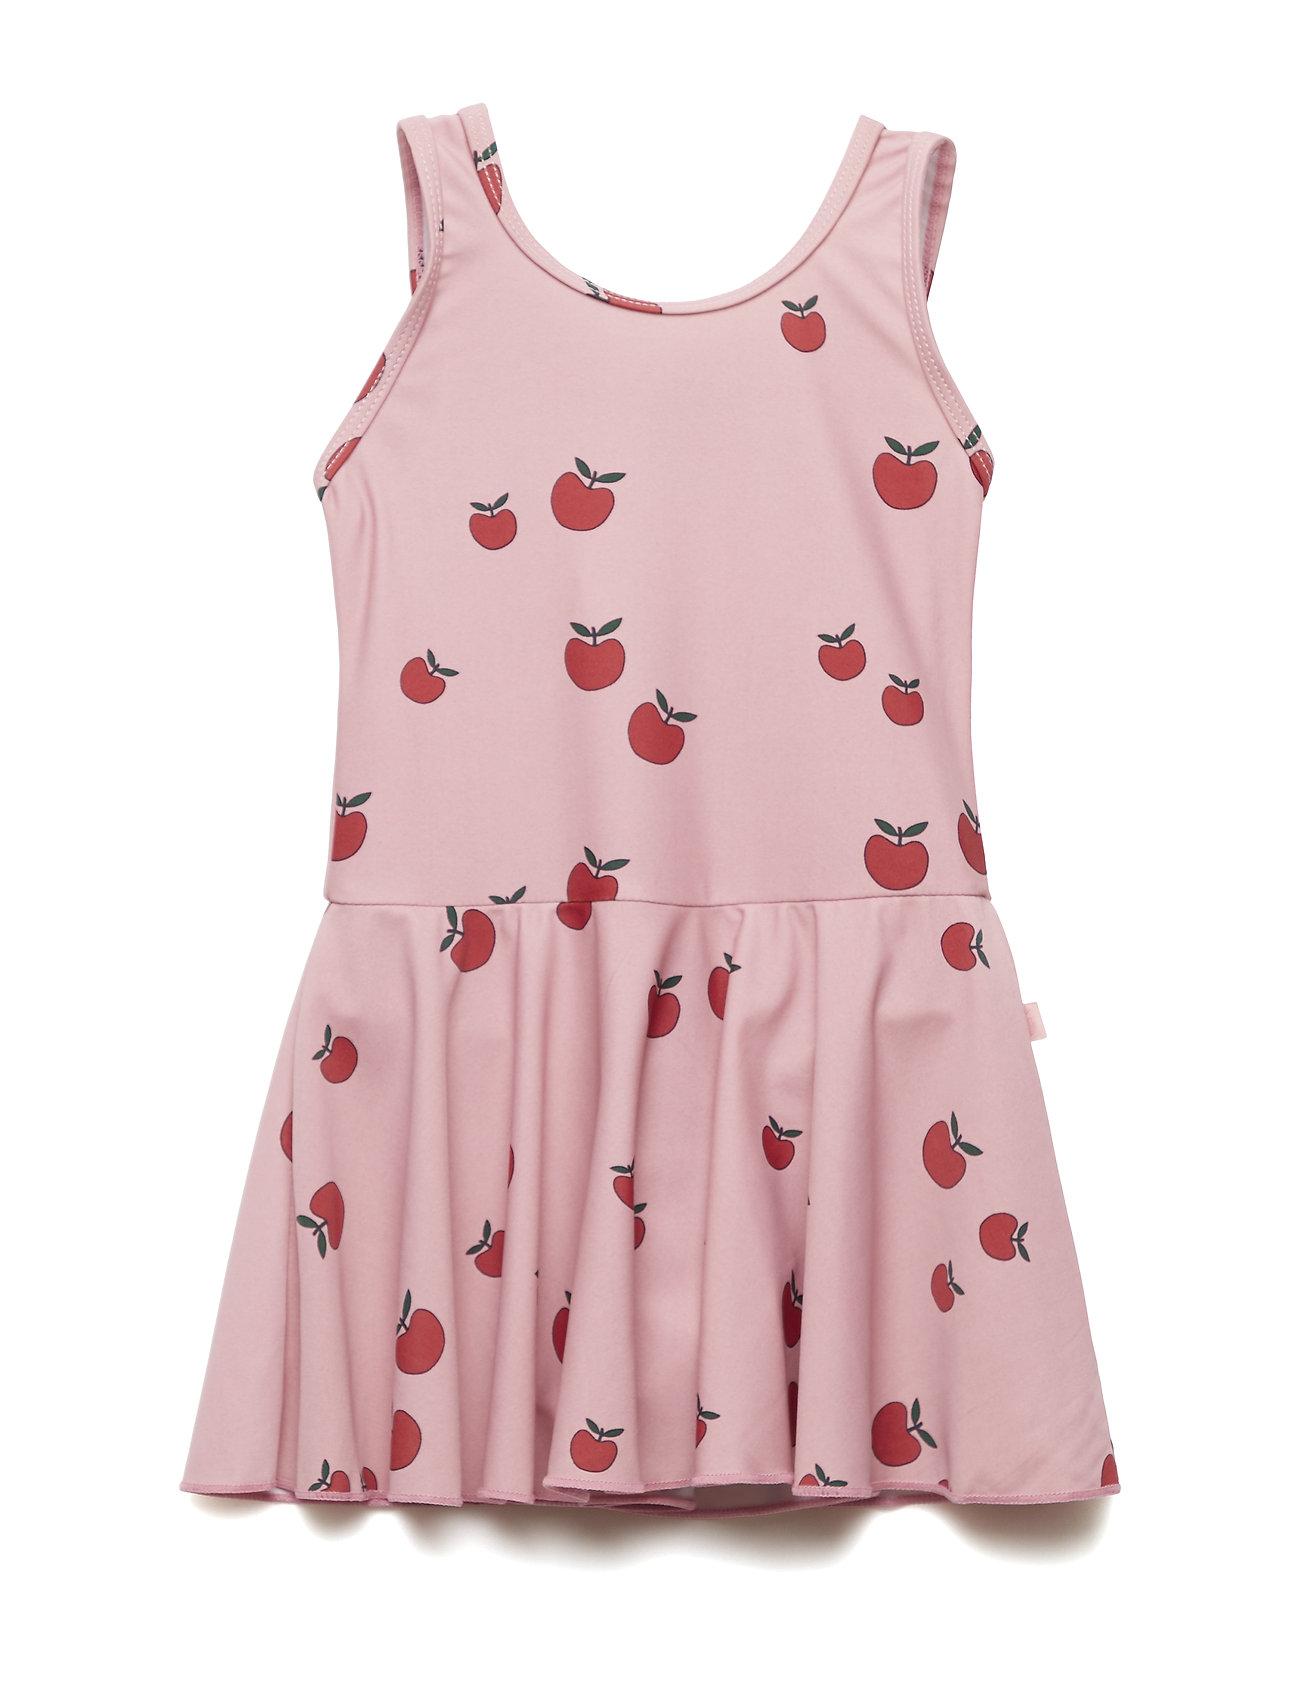 Småfolk Swim Dress. Apple - BLUSH